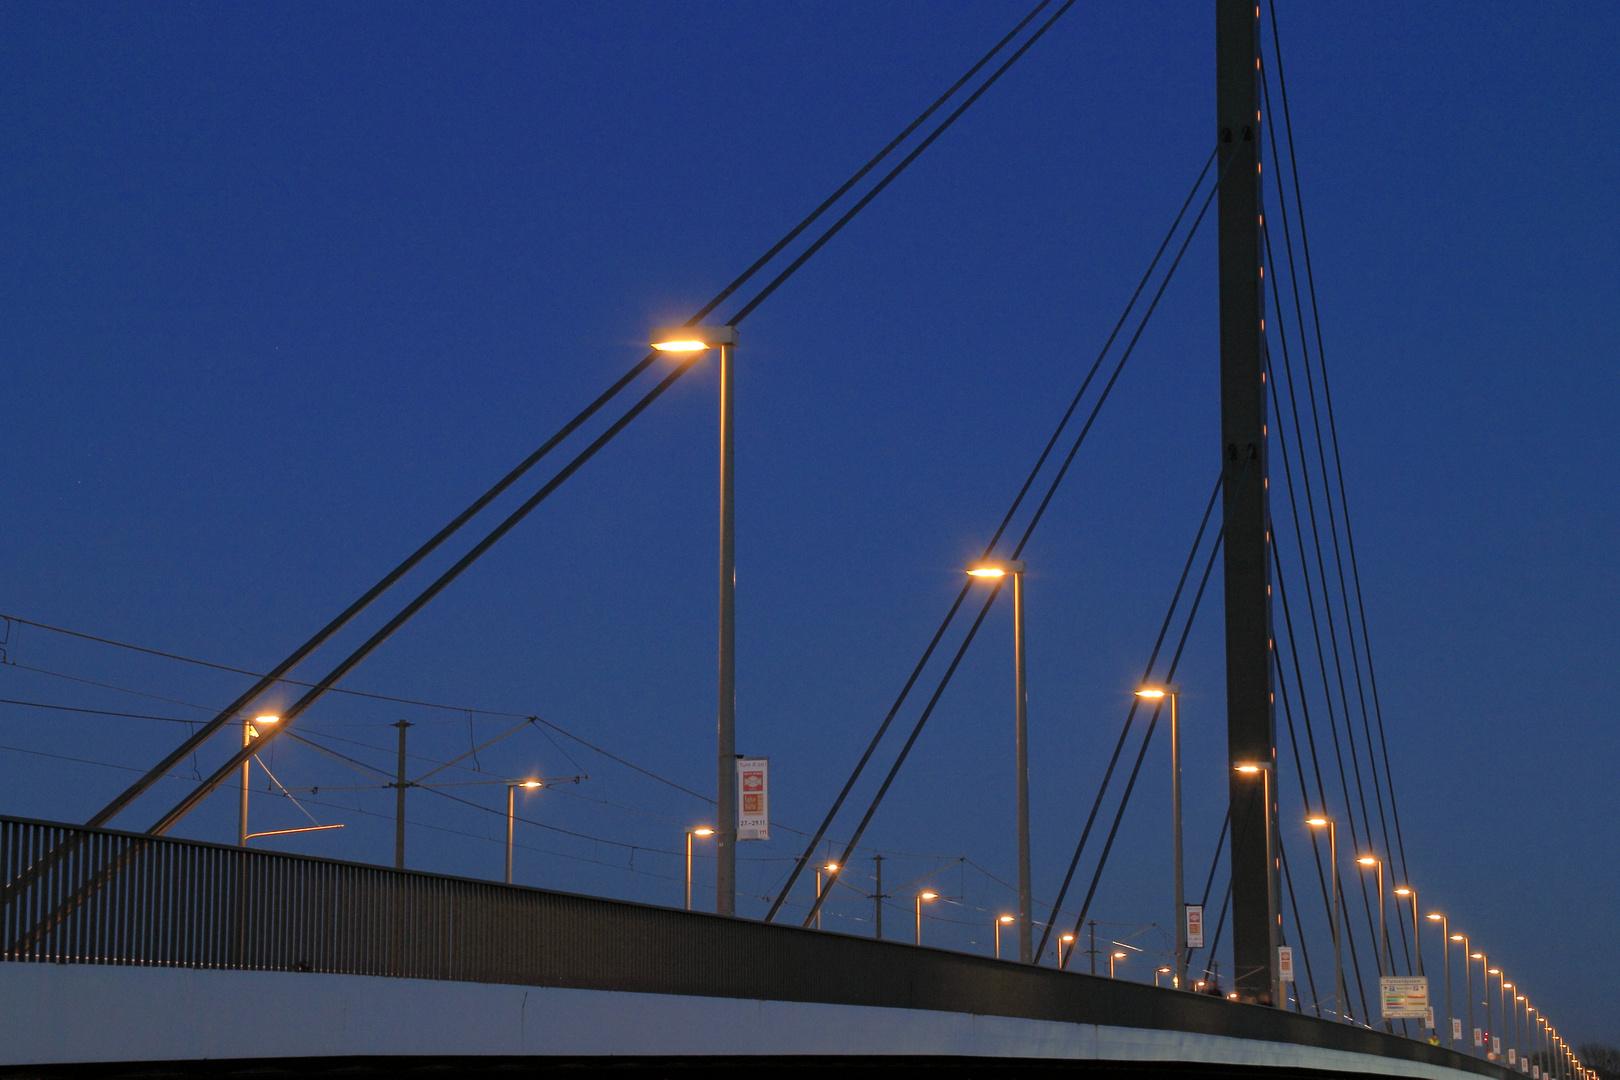 Oberkassler Brücke über den Rhein, Rheinbrücke